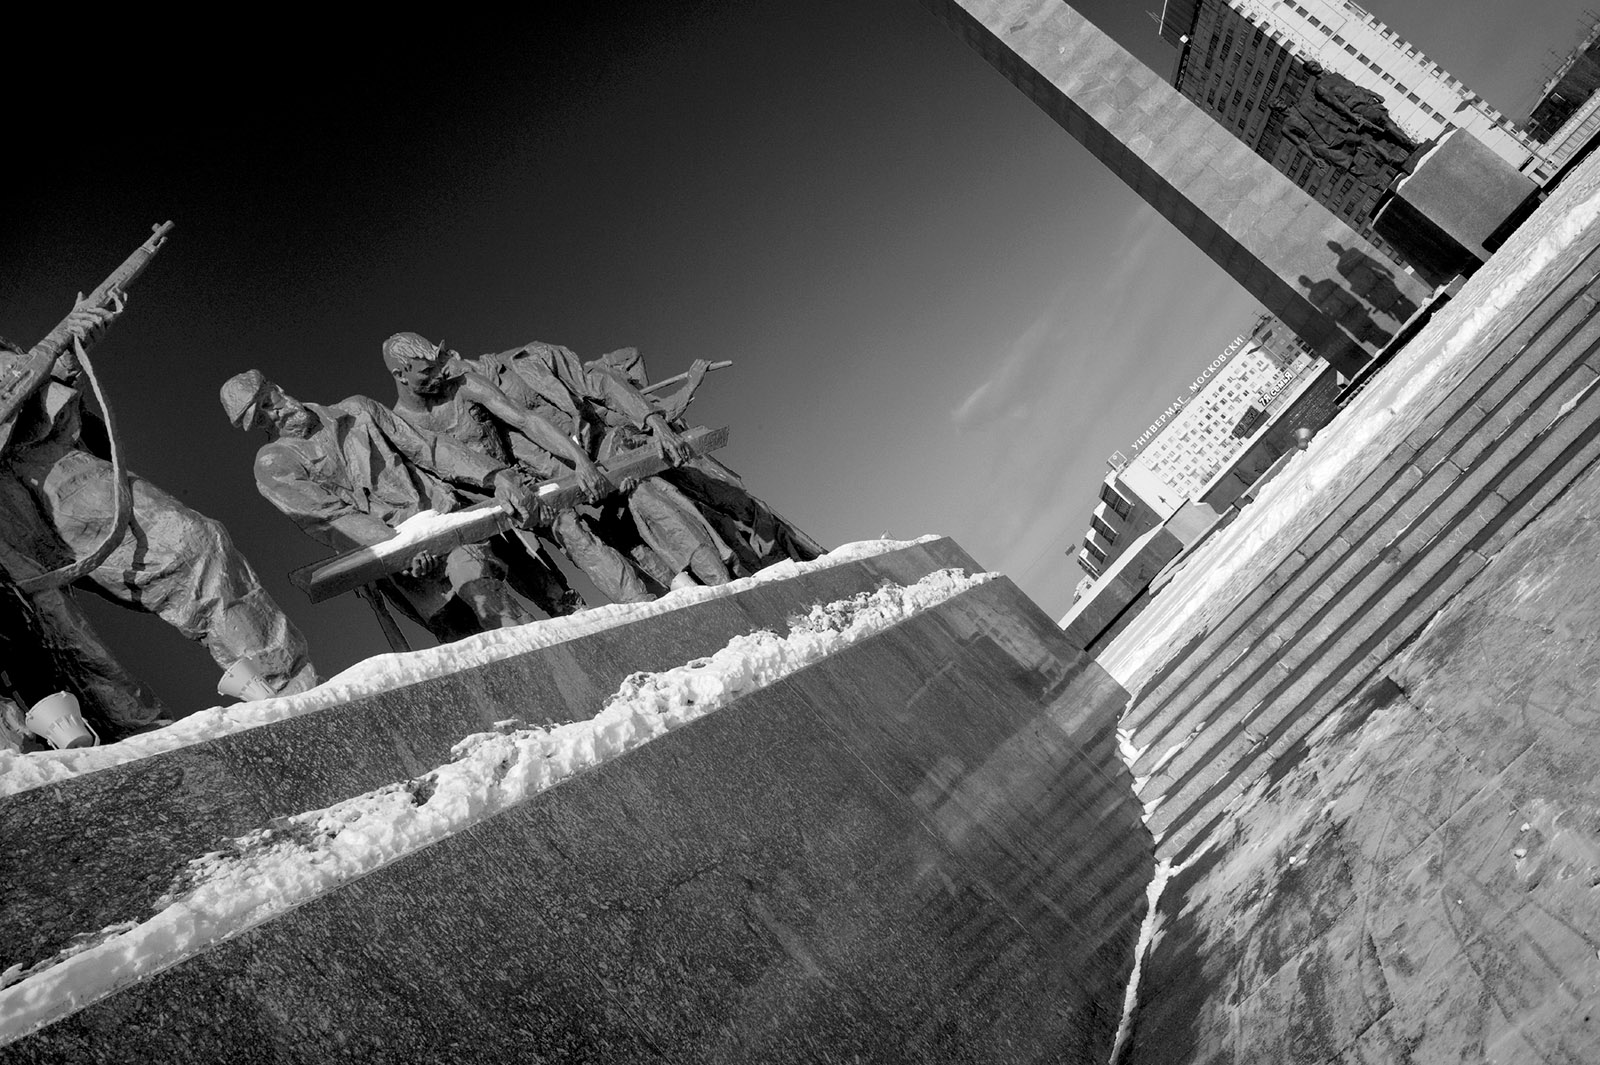 Monument to the Heroic Defenders of Leningrad, St. Petersburg, Russia, 2011